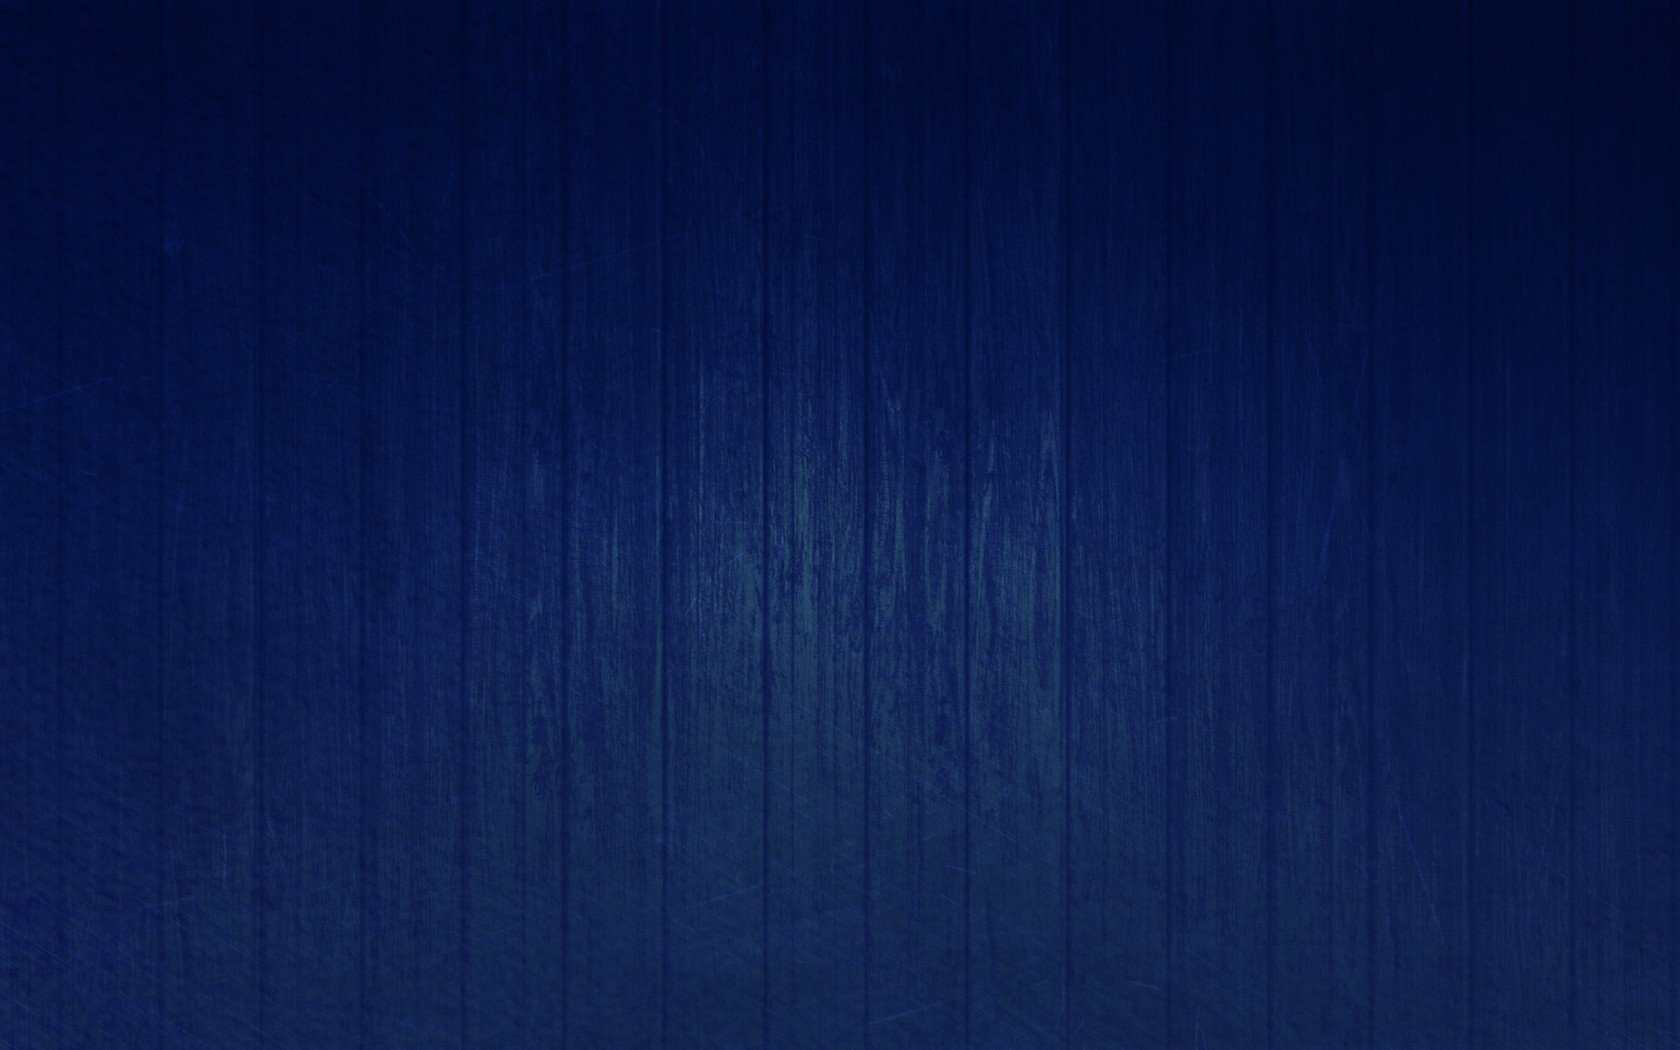 cool backgrounds blue cool backgrounds blue cool backgrounds blue 1680x1050